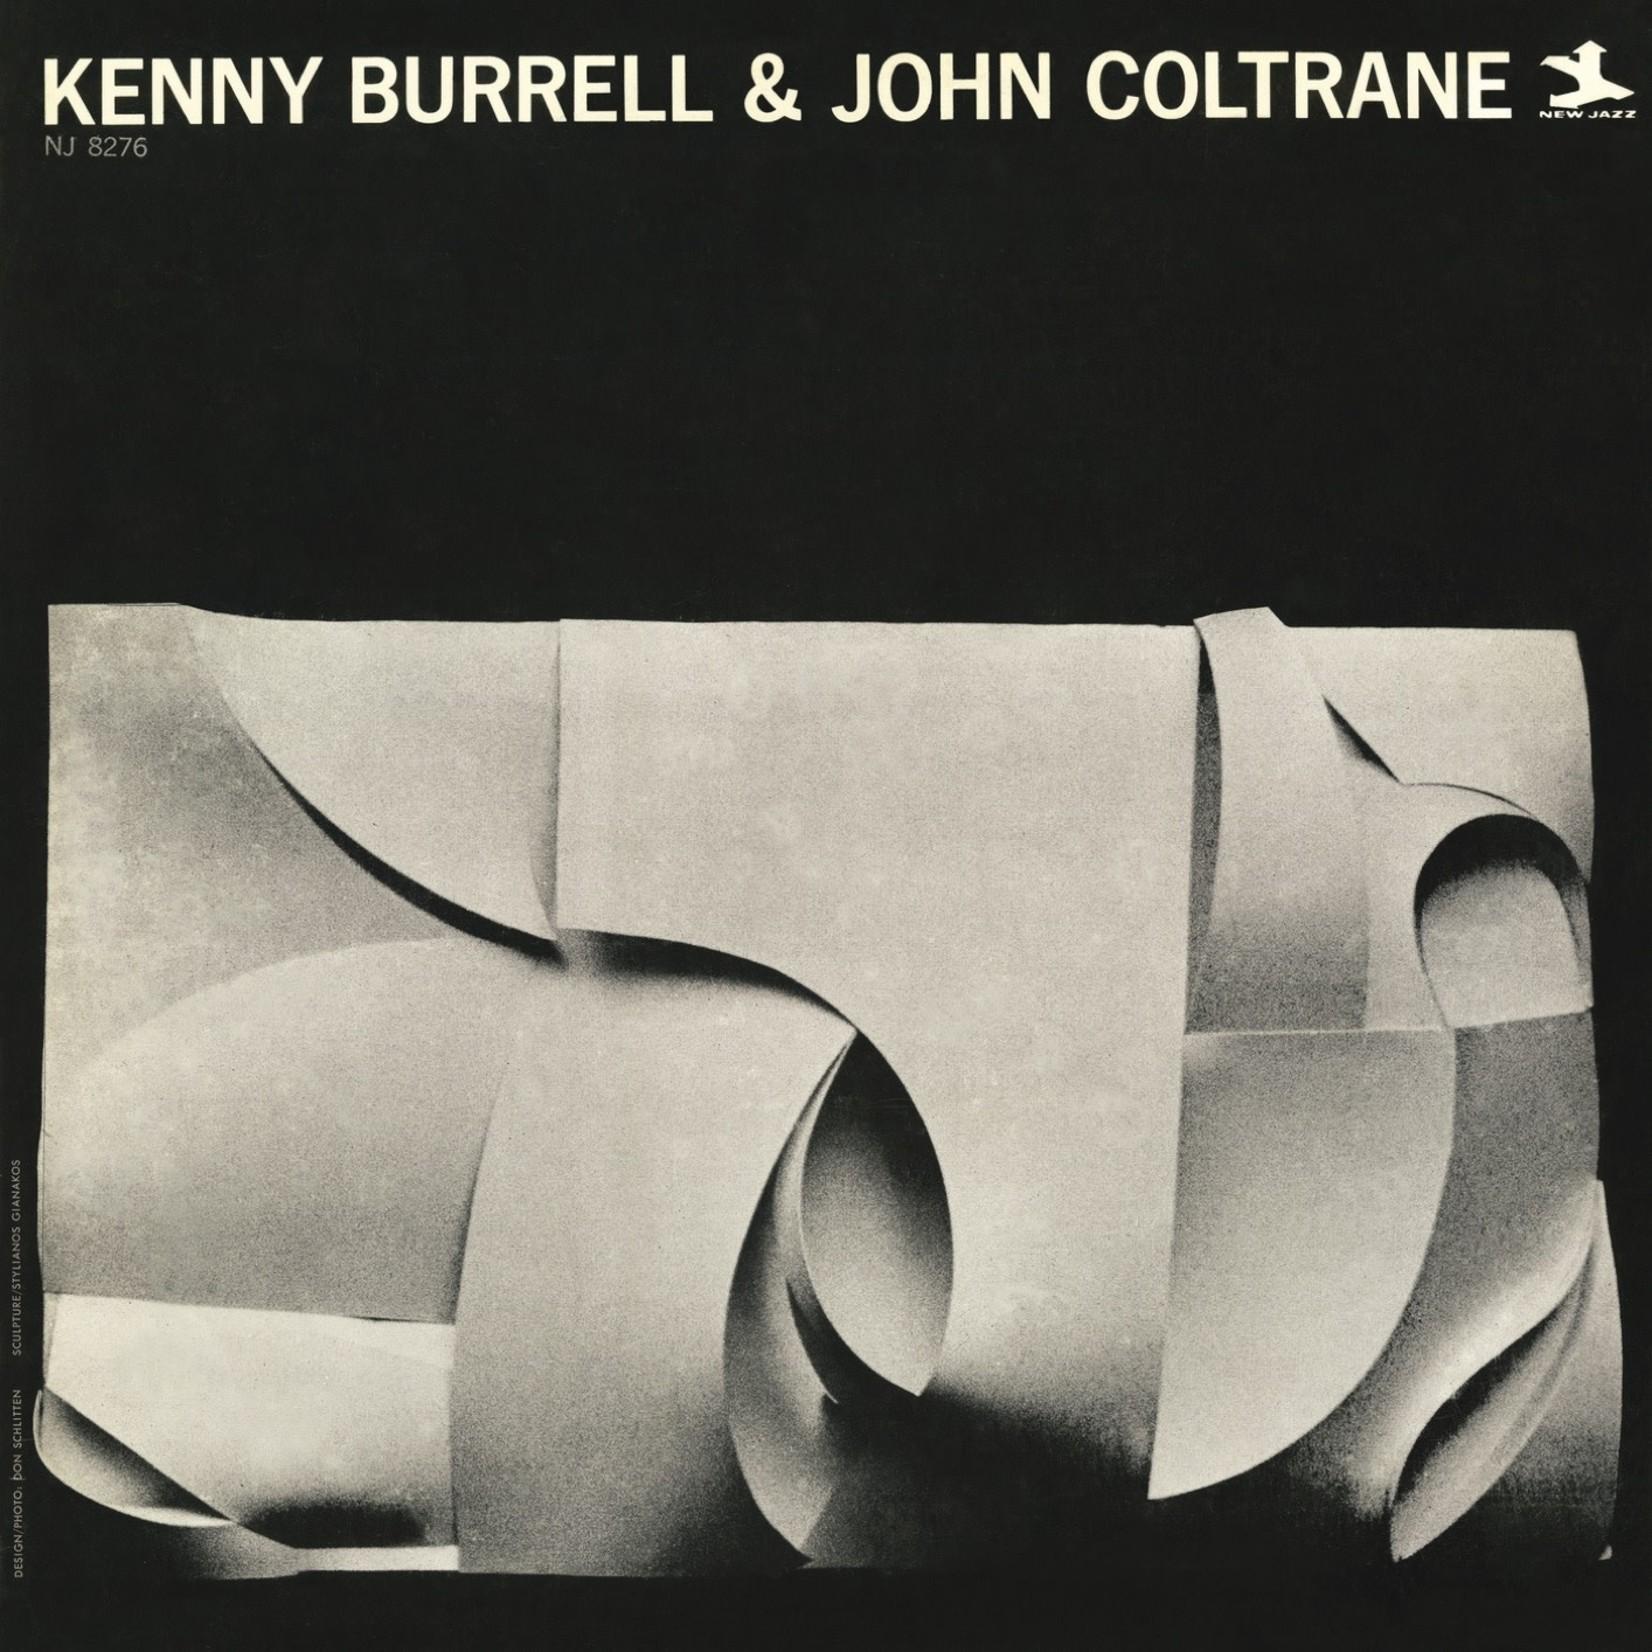 [New] Burrell, Kenny & John Coltrane: Kenny Burrell And John Coltrane